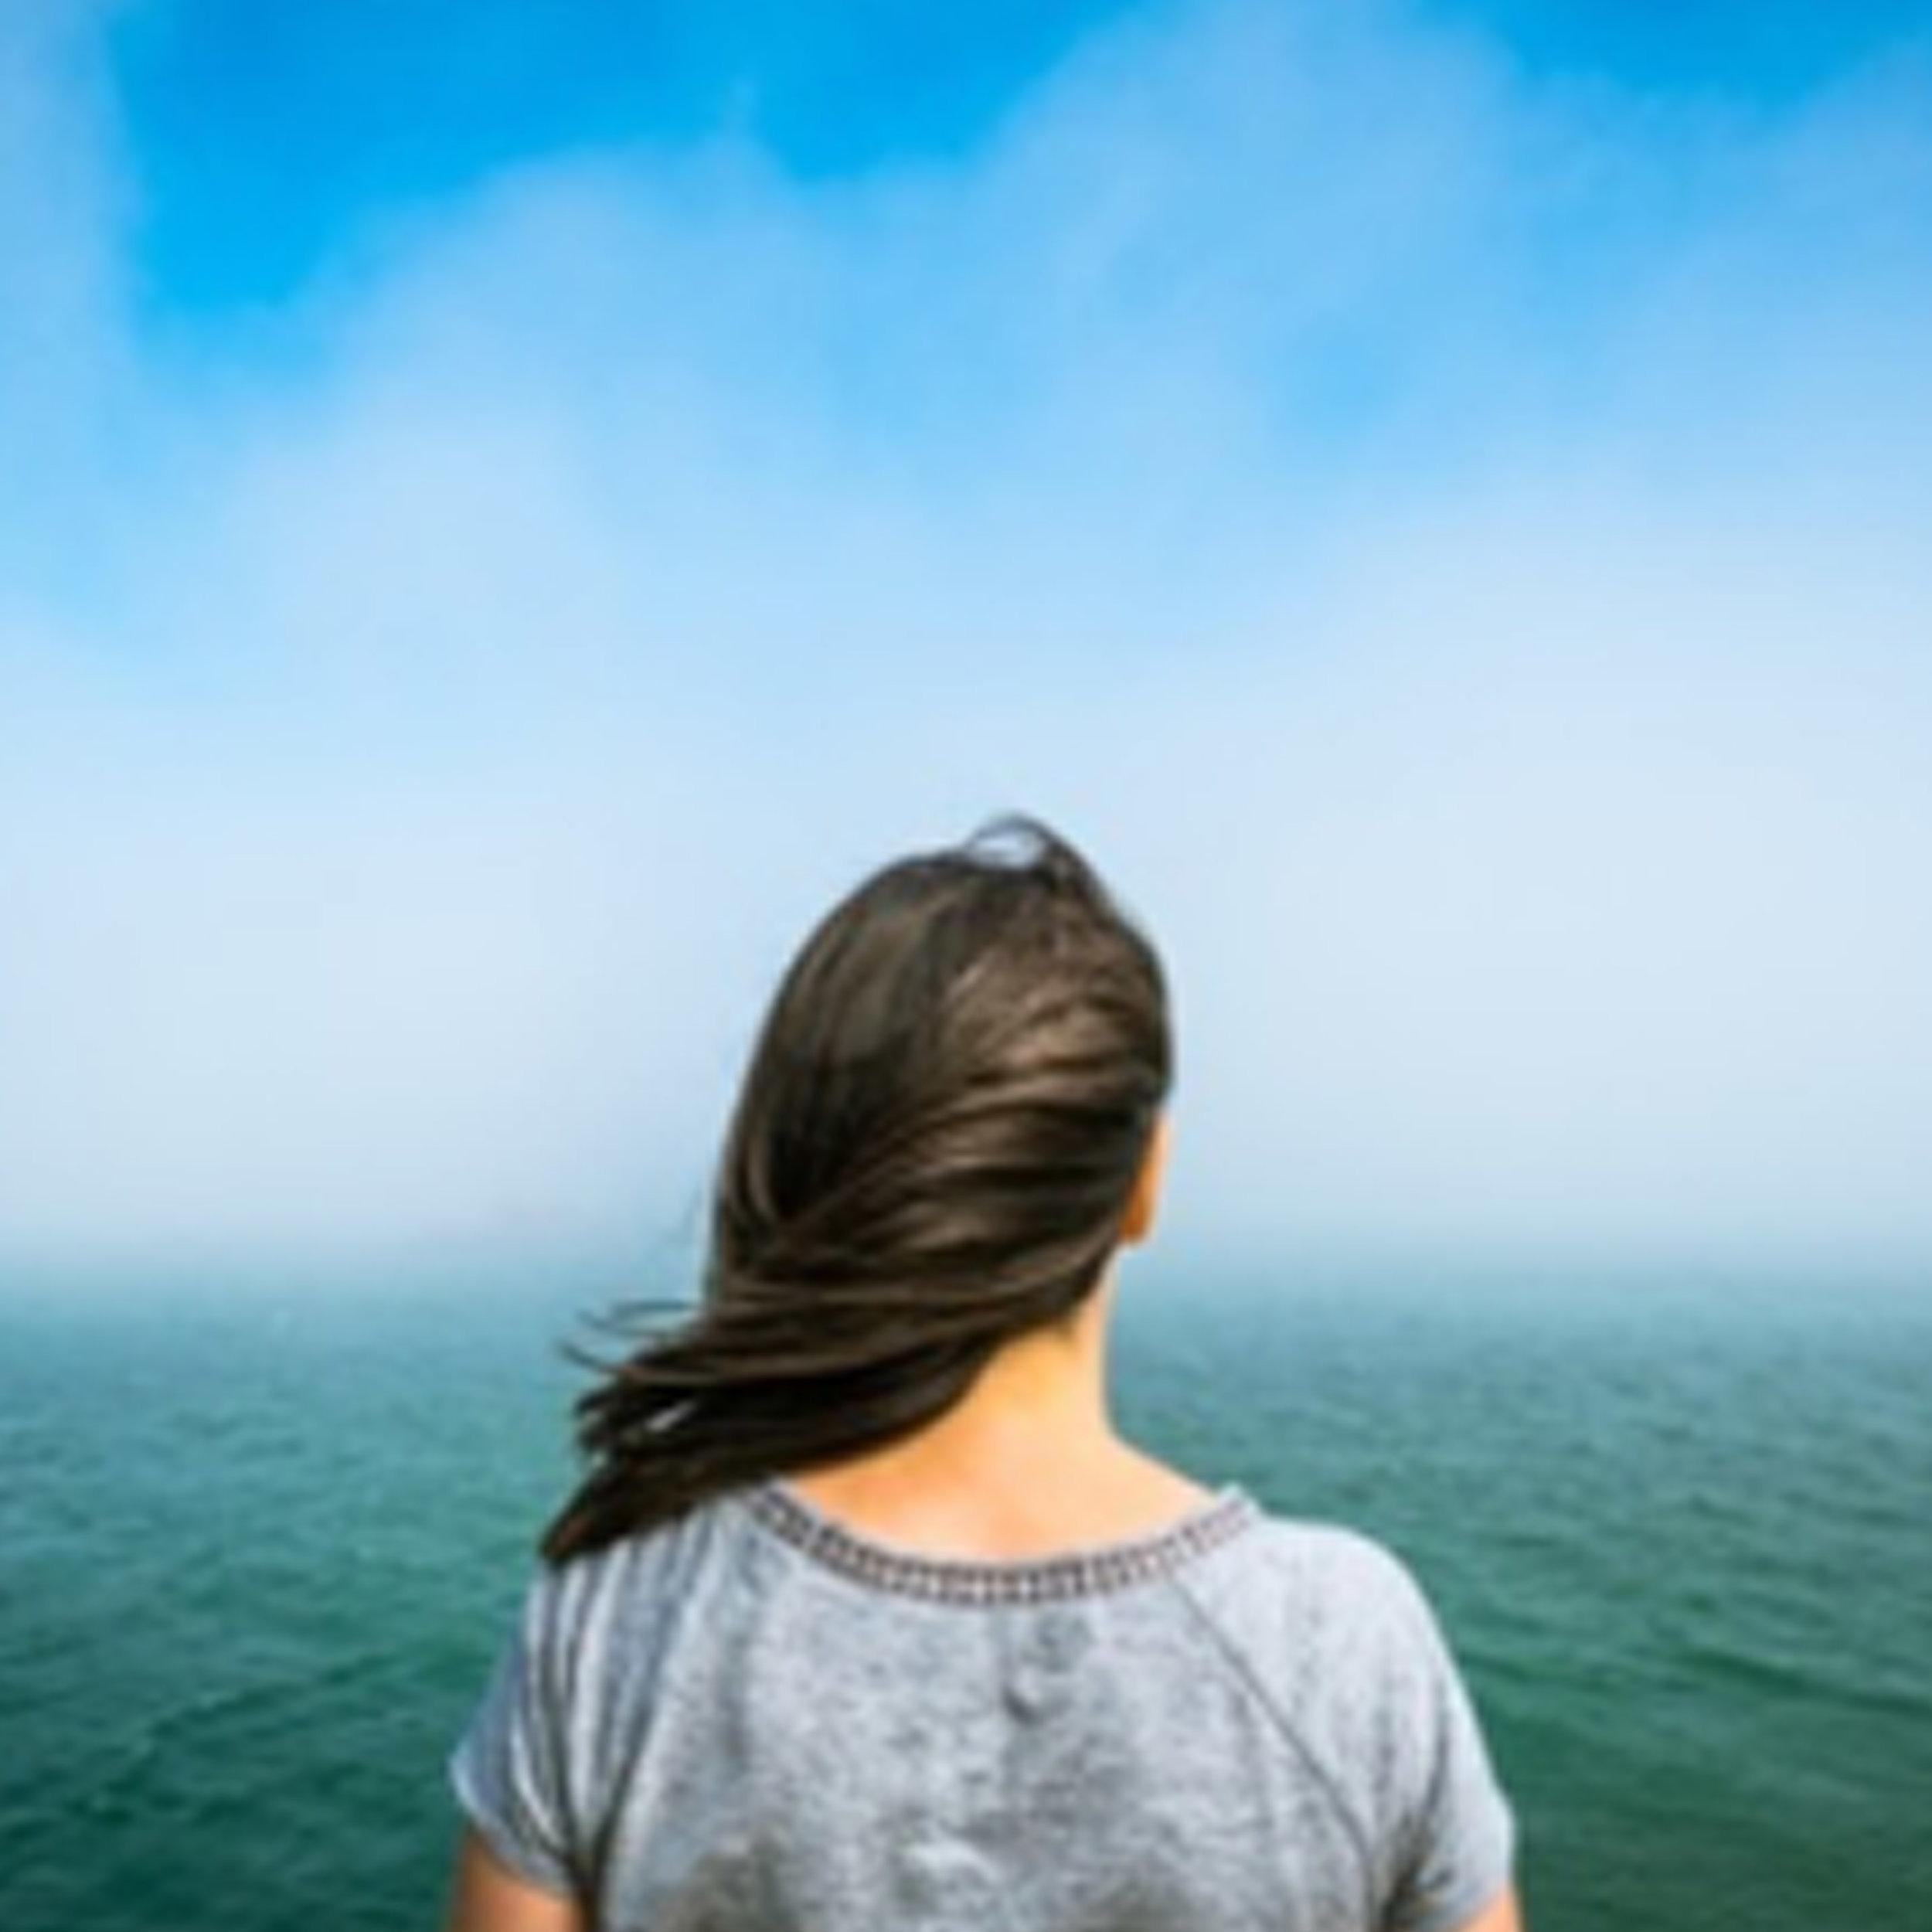 Woman-Looking-at-Sea.jpg